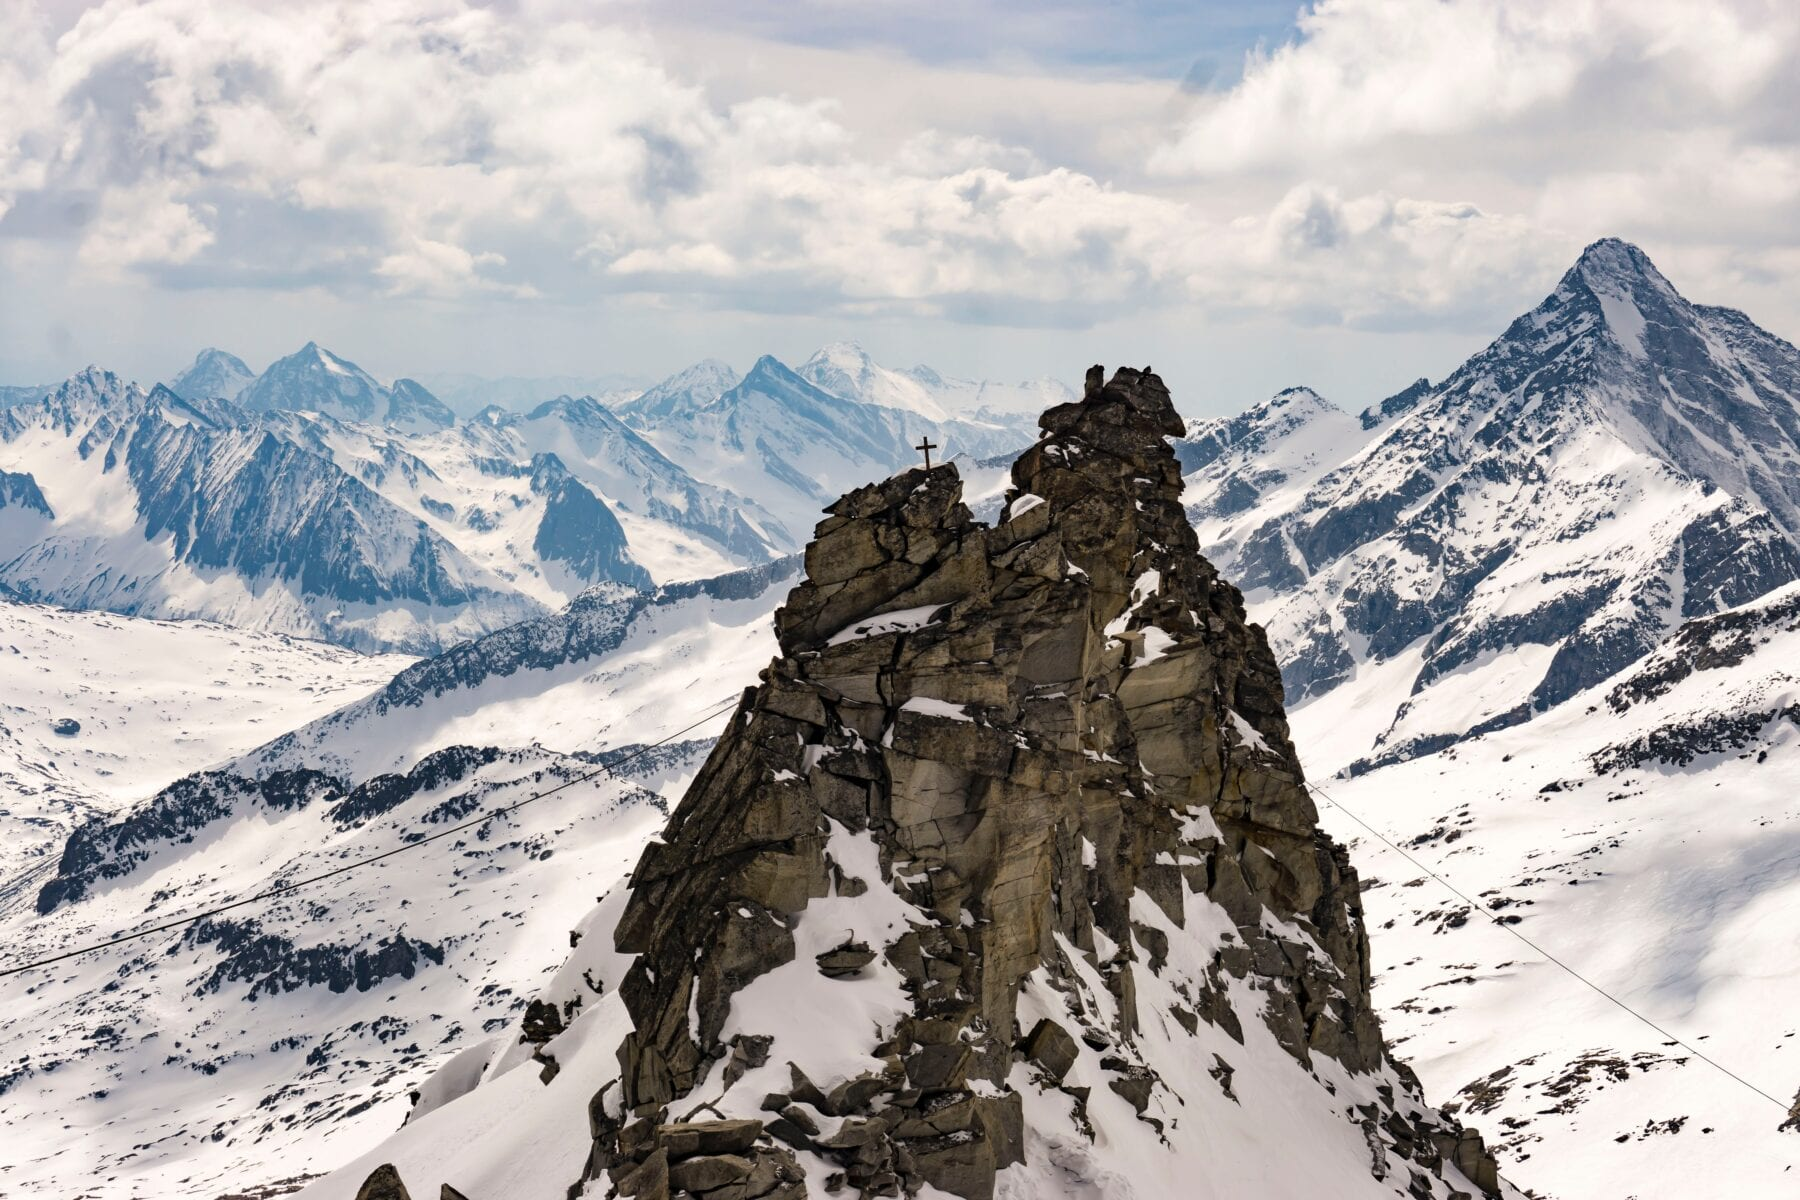 De Hintertuxer Gletsjer hoort in het rijtje van mooiste gletsjers van Europa